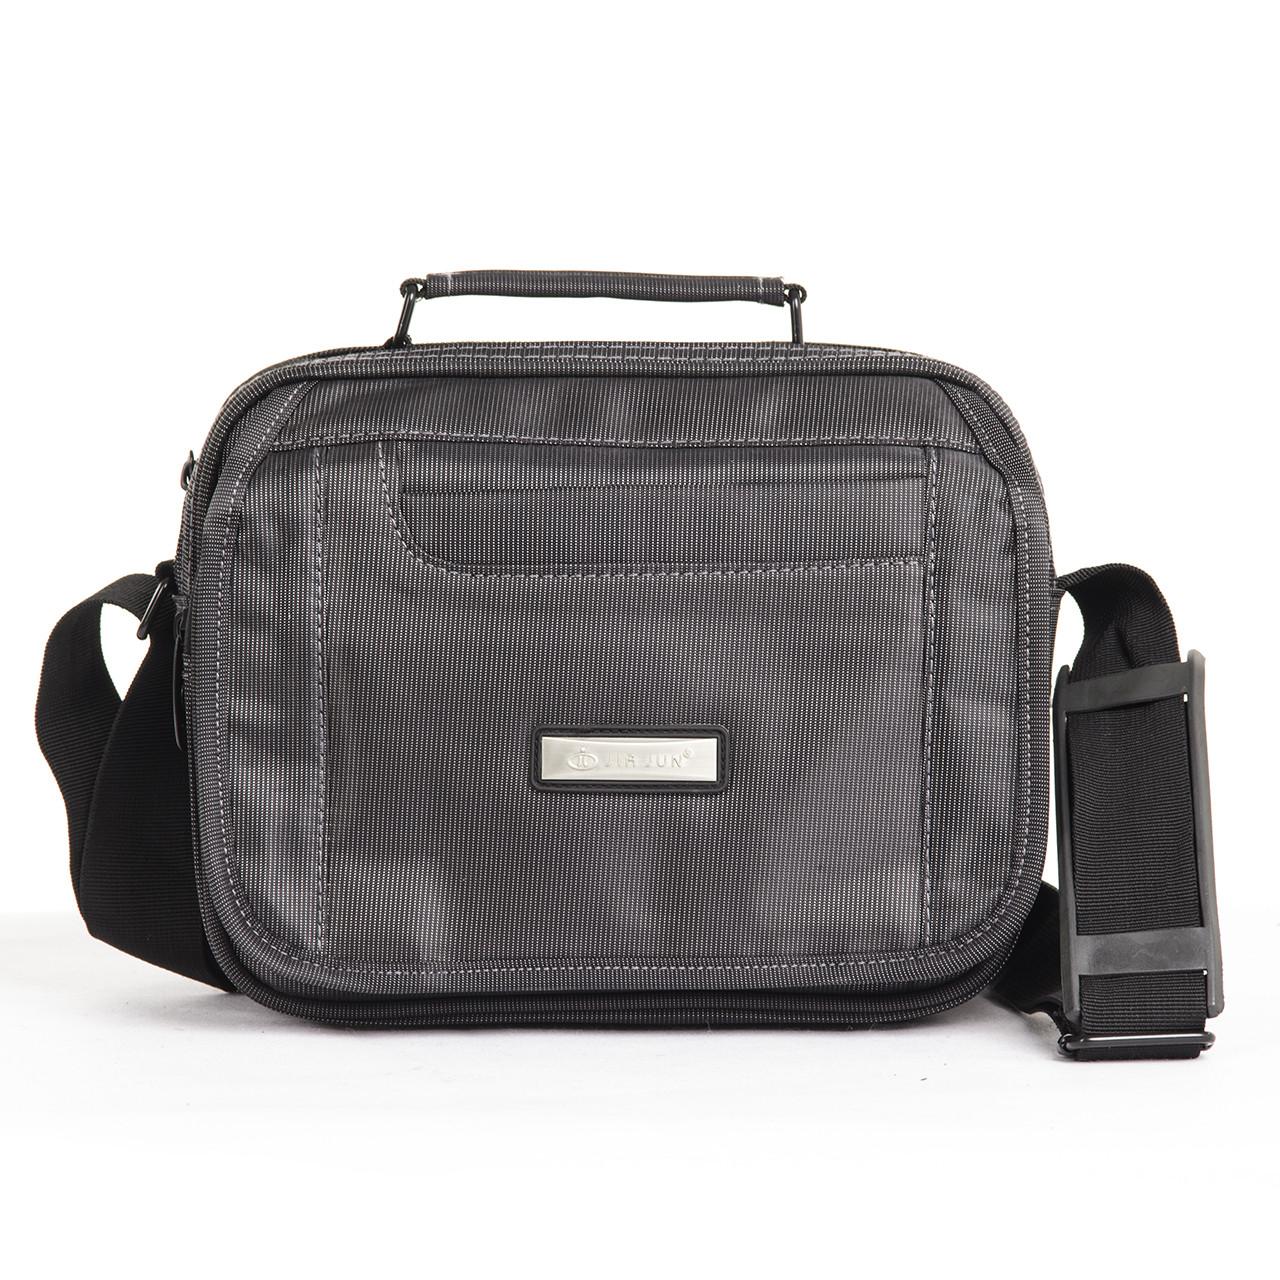 Мужская сумка Jia Jun 26х21х12 горизонтальная, ткань Полиэстр ксЖ802